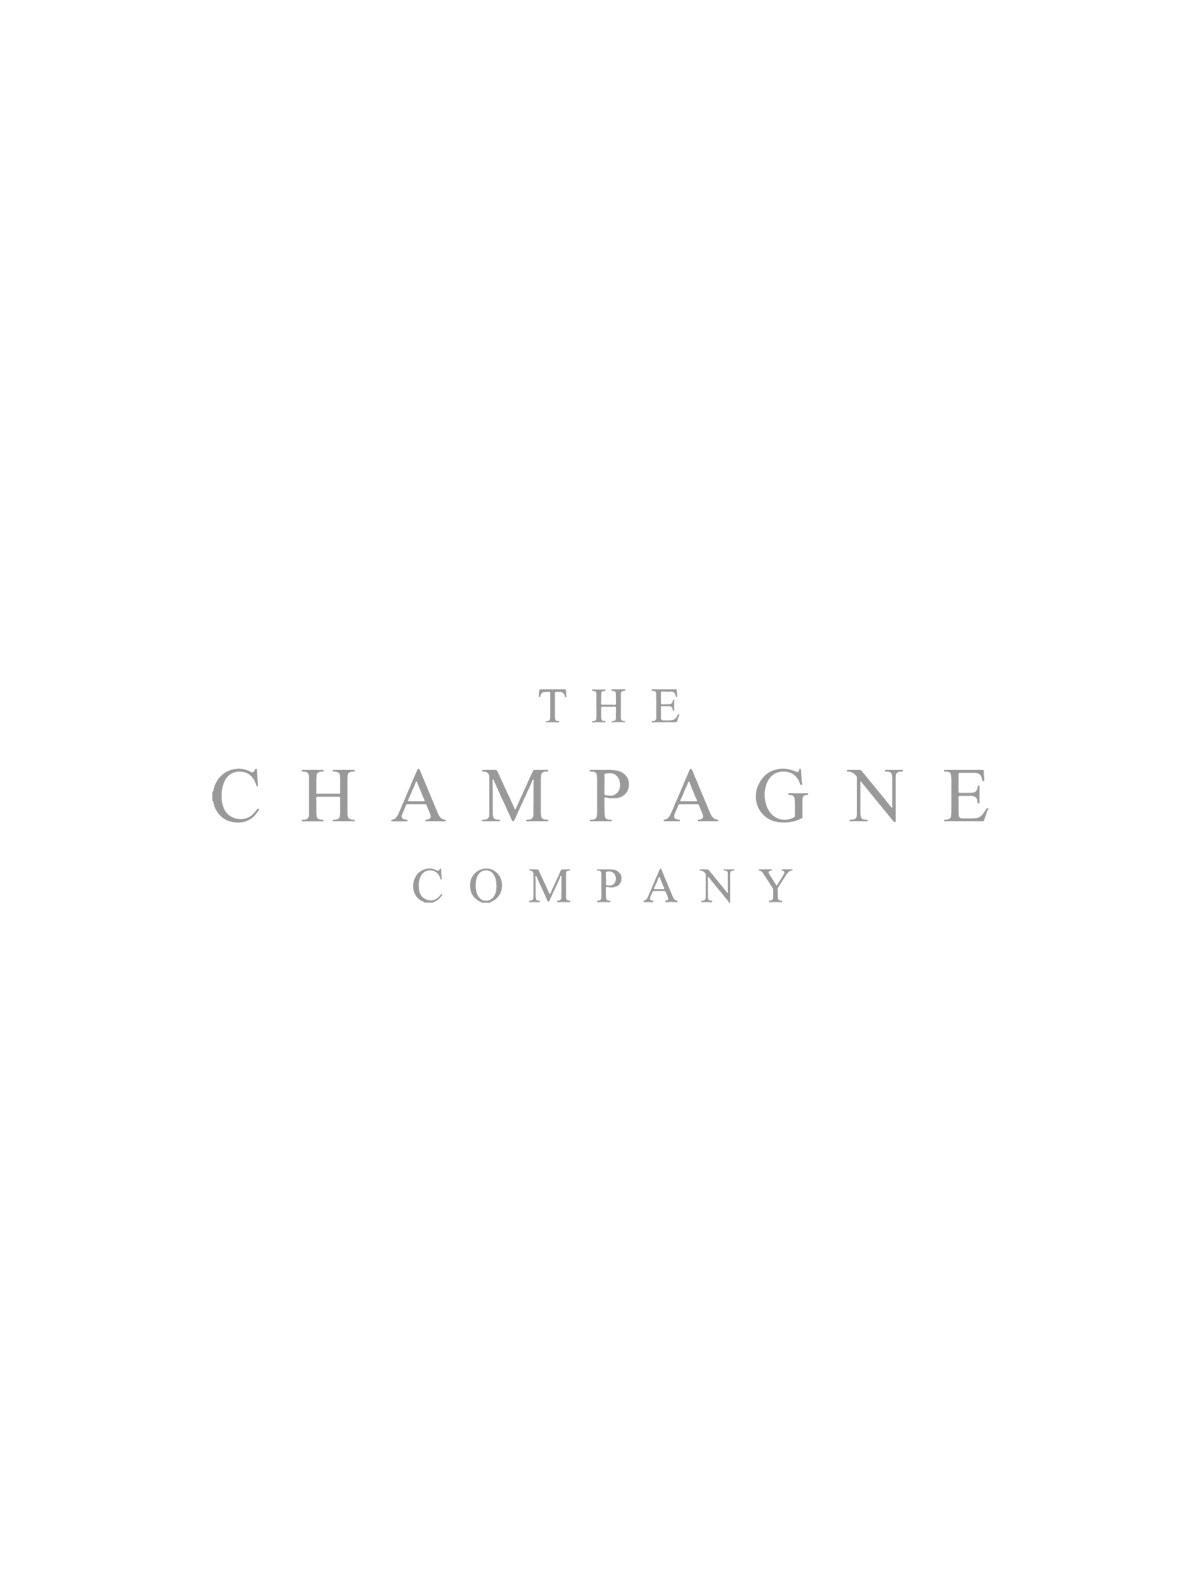 Dom Perignon Rose 1993 Plenitude P2 Vintage Champagne 75cl Gift Boxed